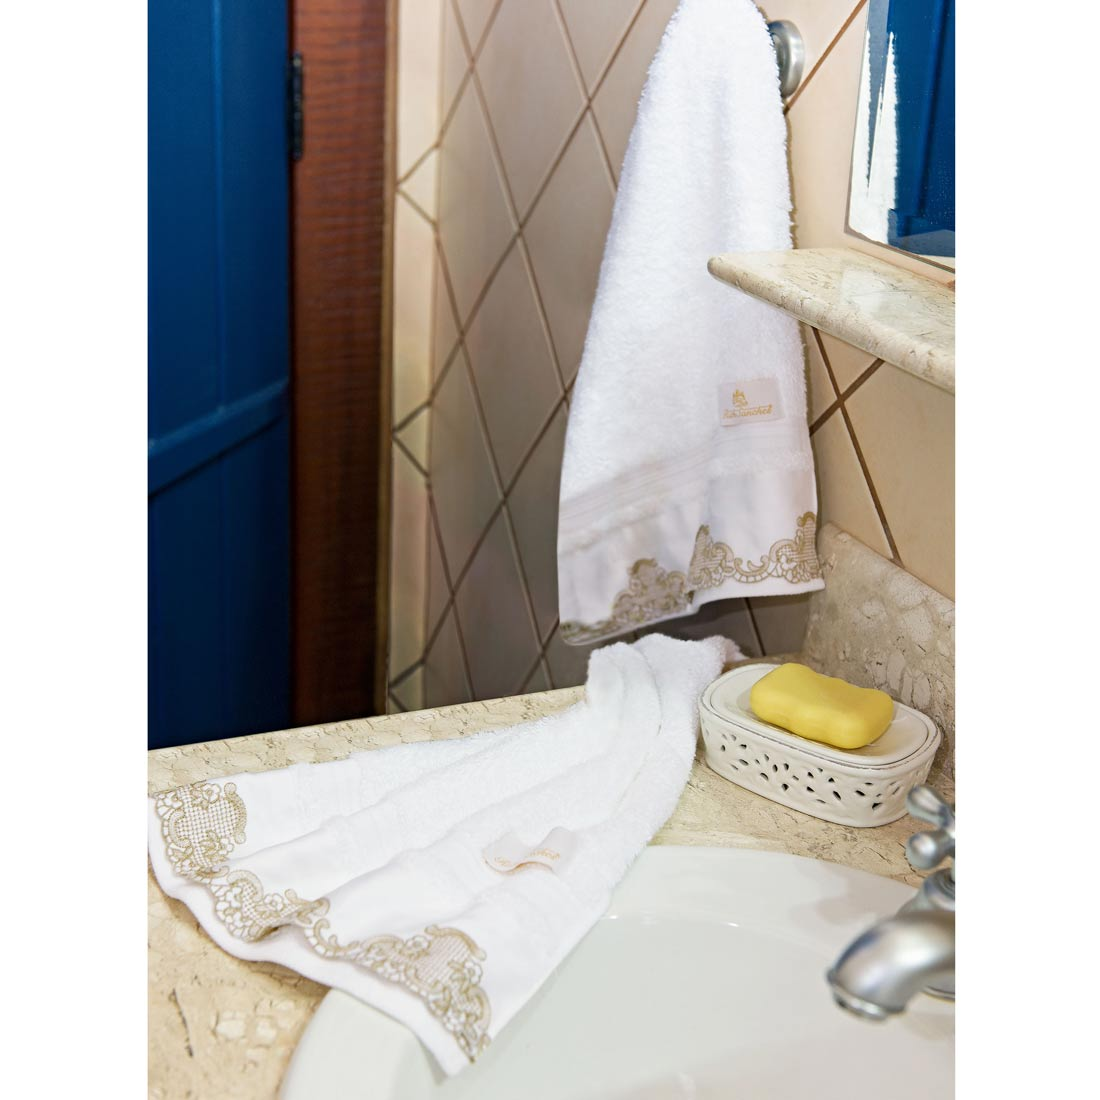 Toalhas Lavabo  Pienza cor Branco com 2 peças